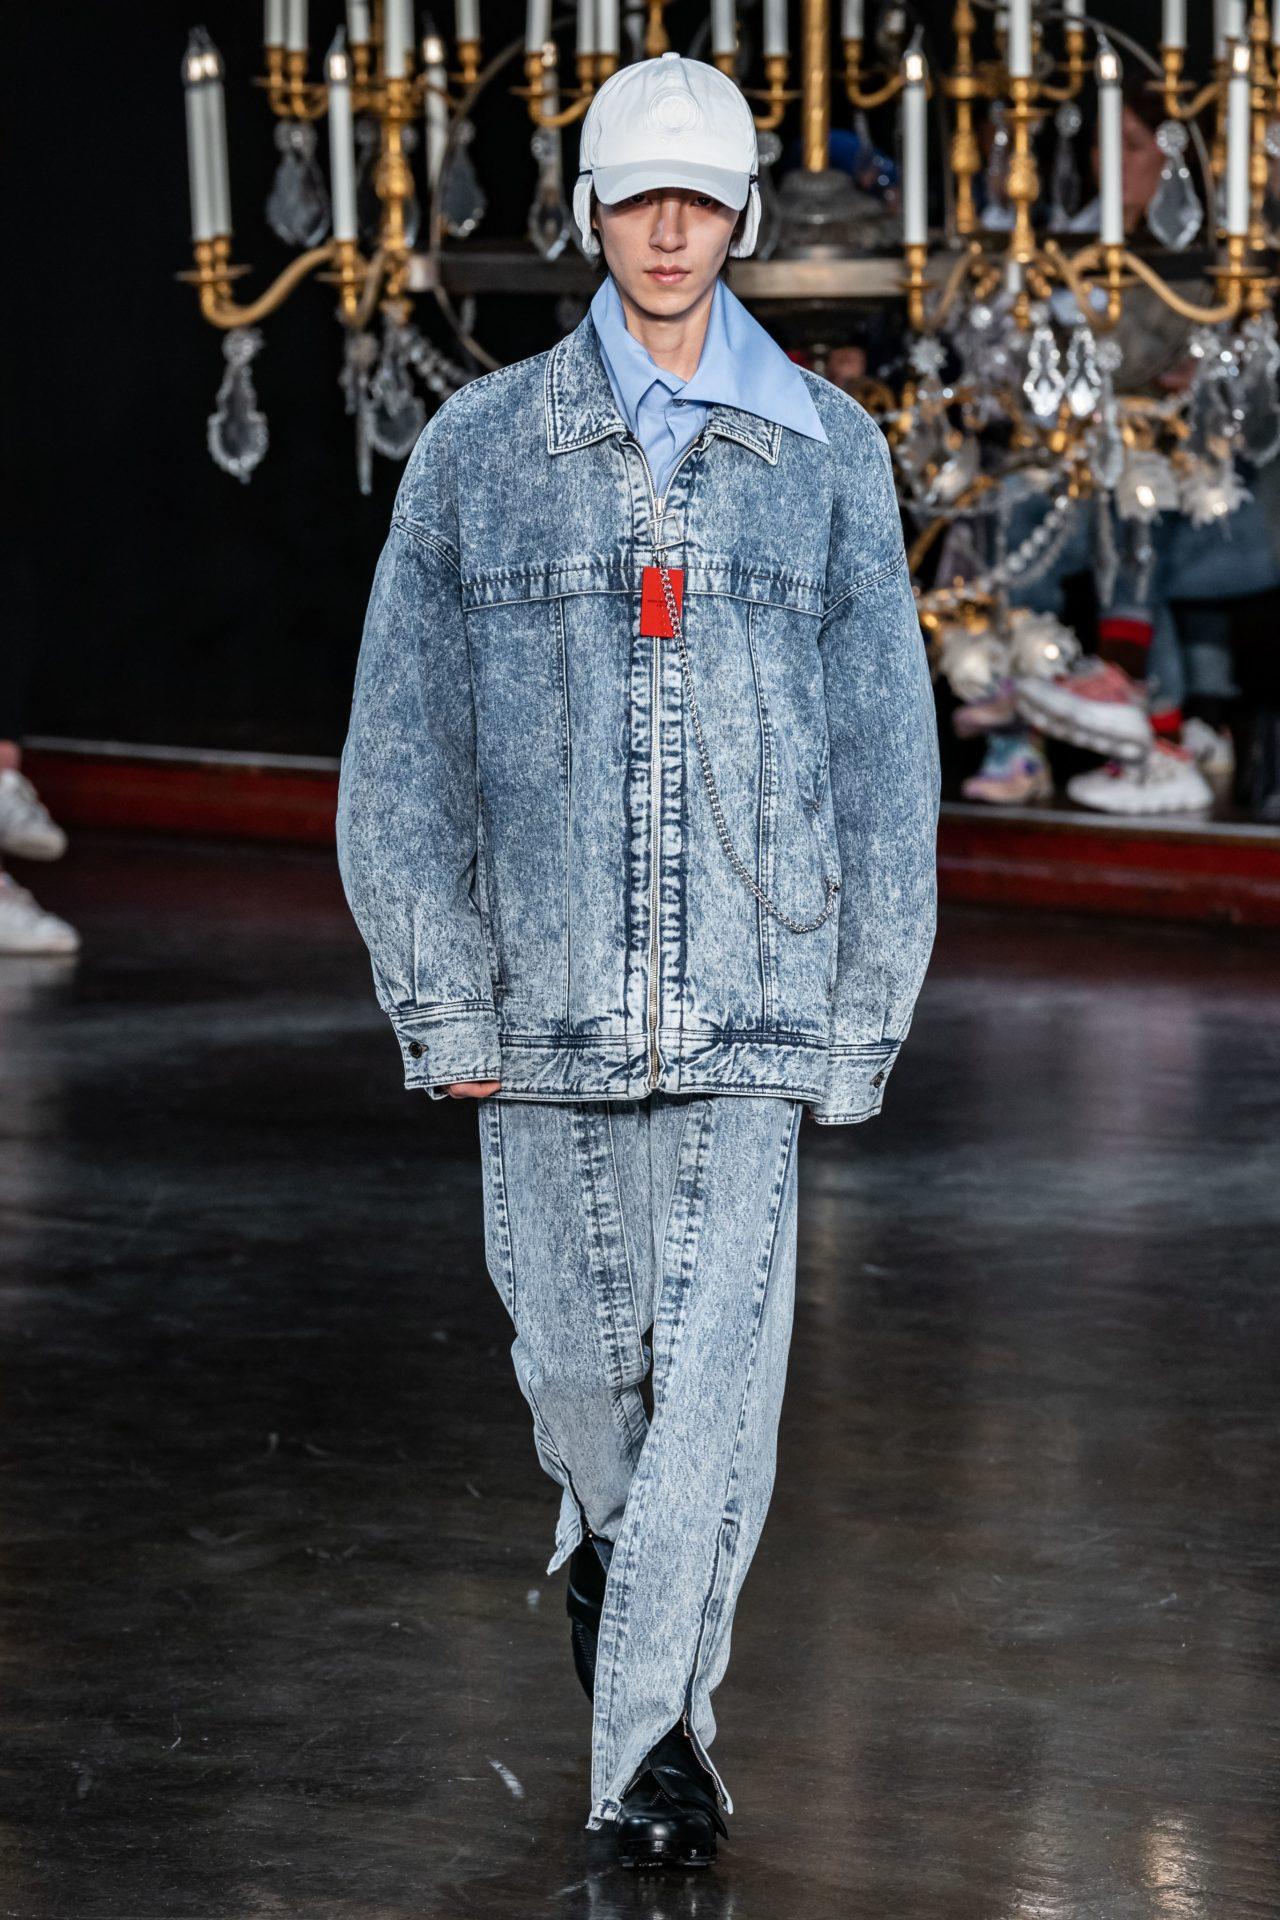 Biggest Men's Fashion Trends 2019